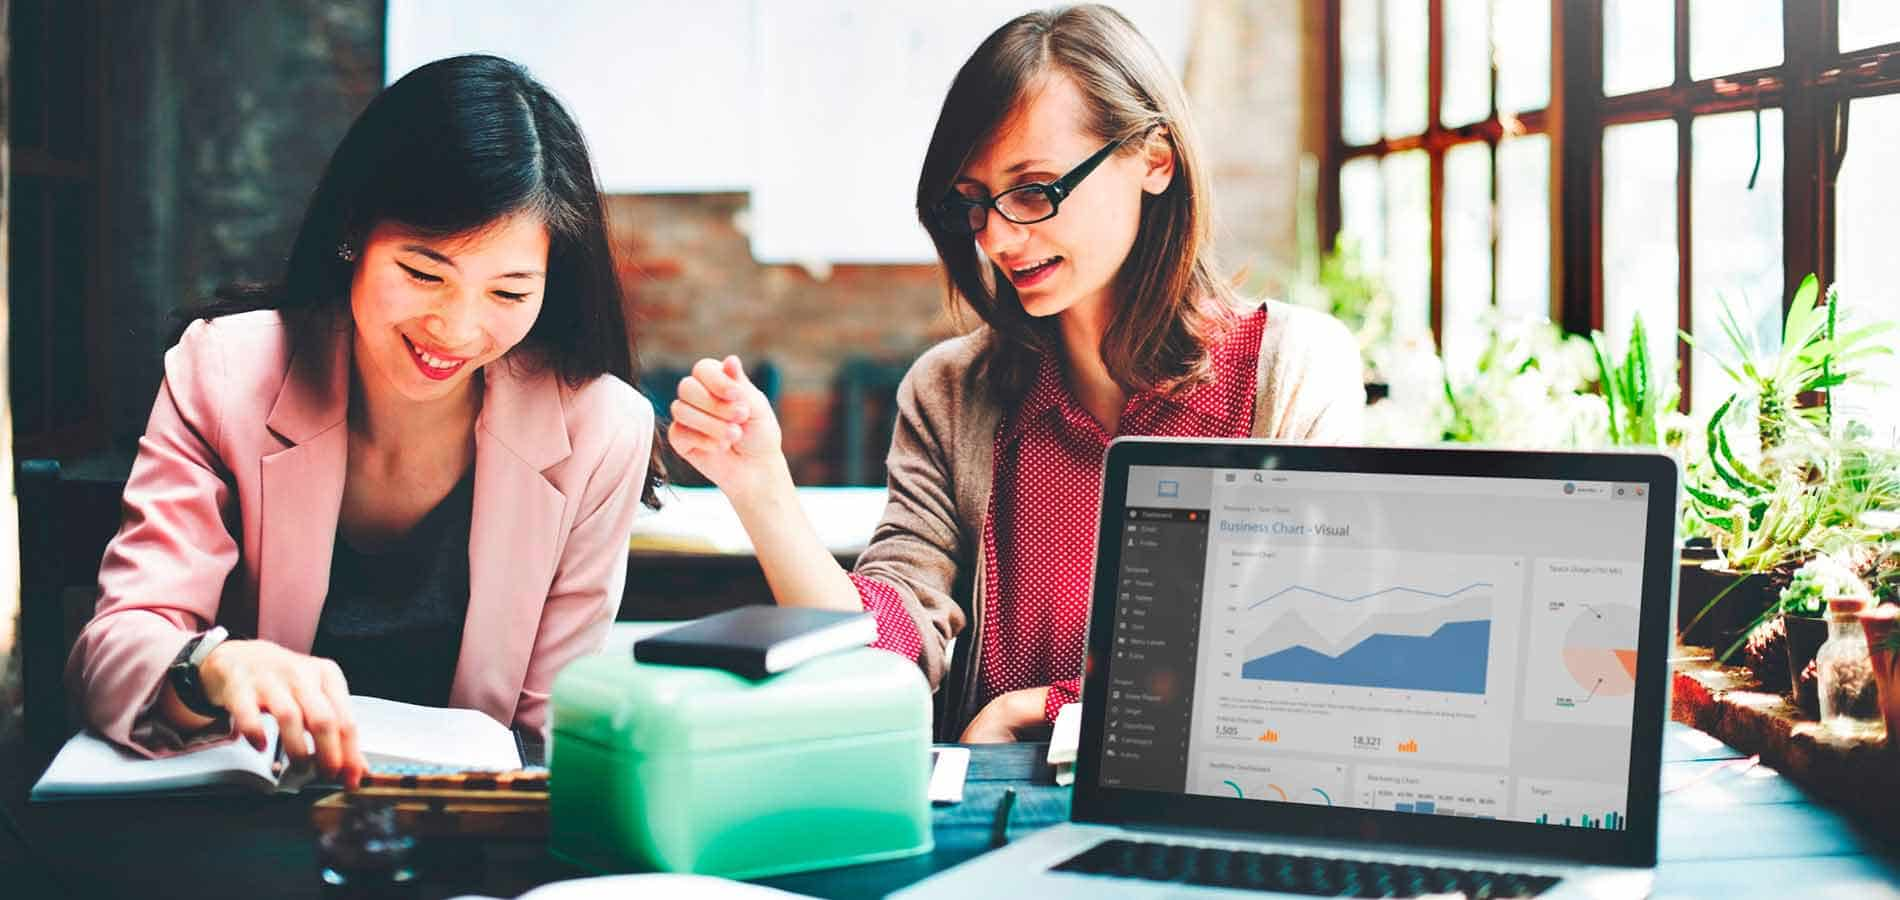 Pursuing a career in Digital Marketing? DMI can help!